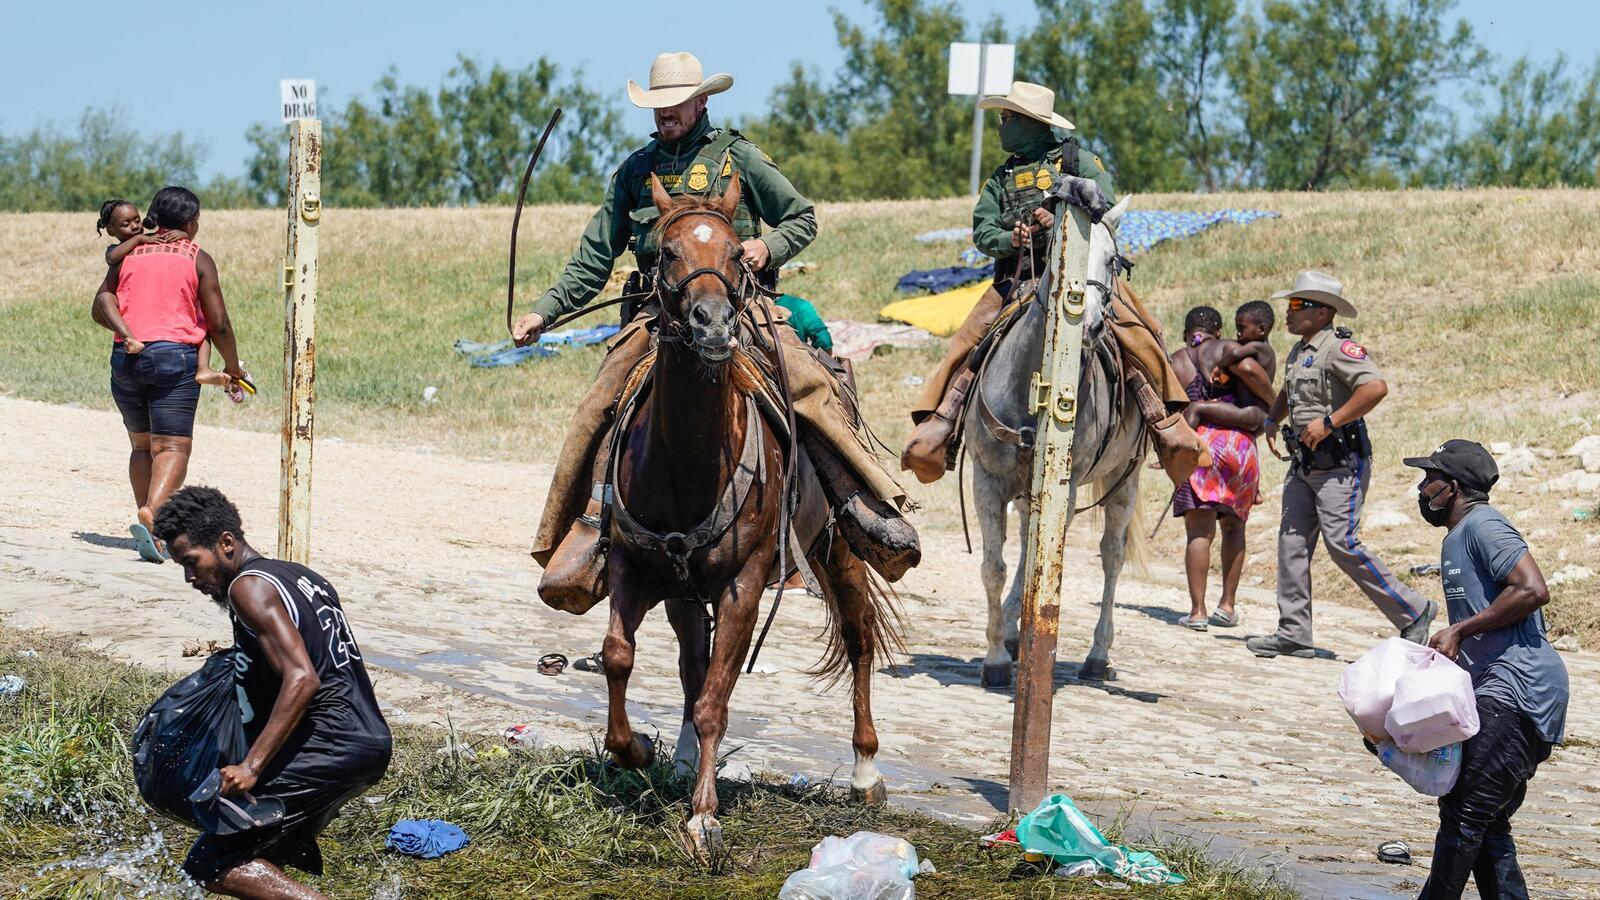 Biden Condemns Images Of Border Patrol Agents On Horseback